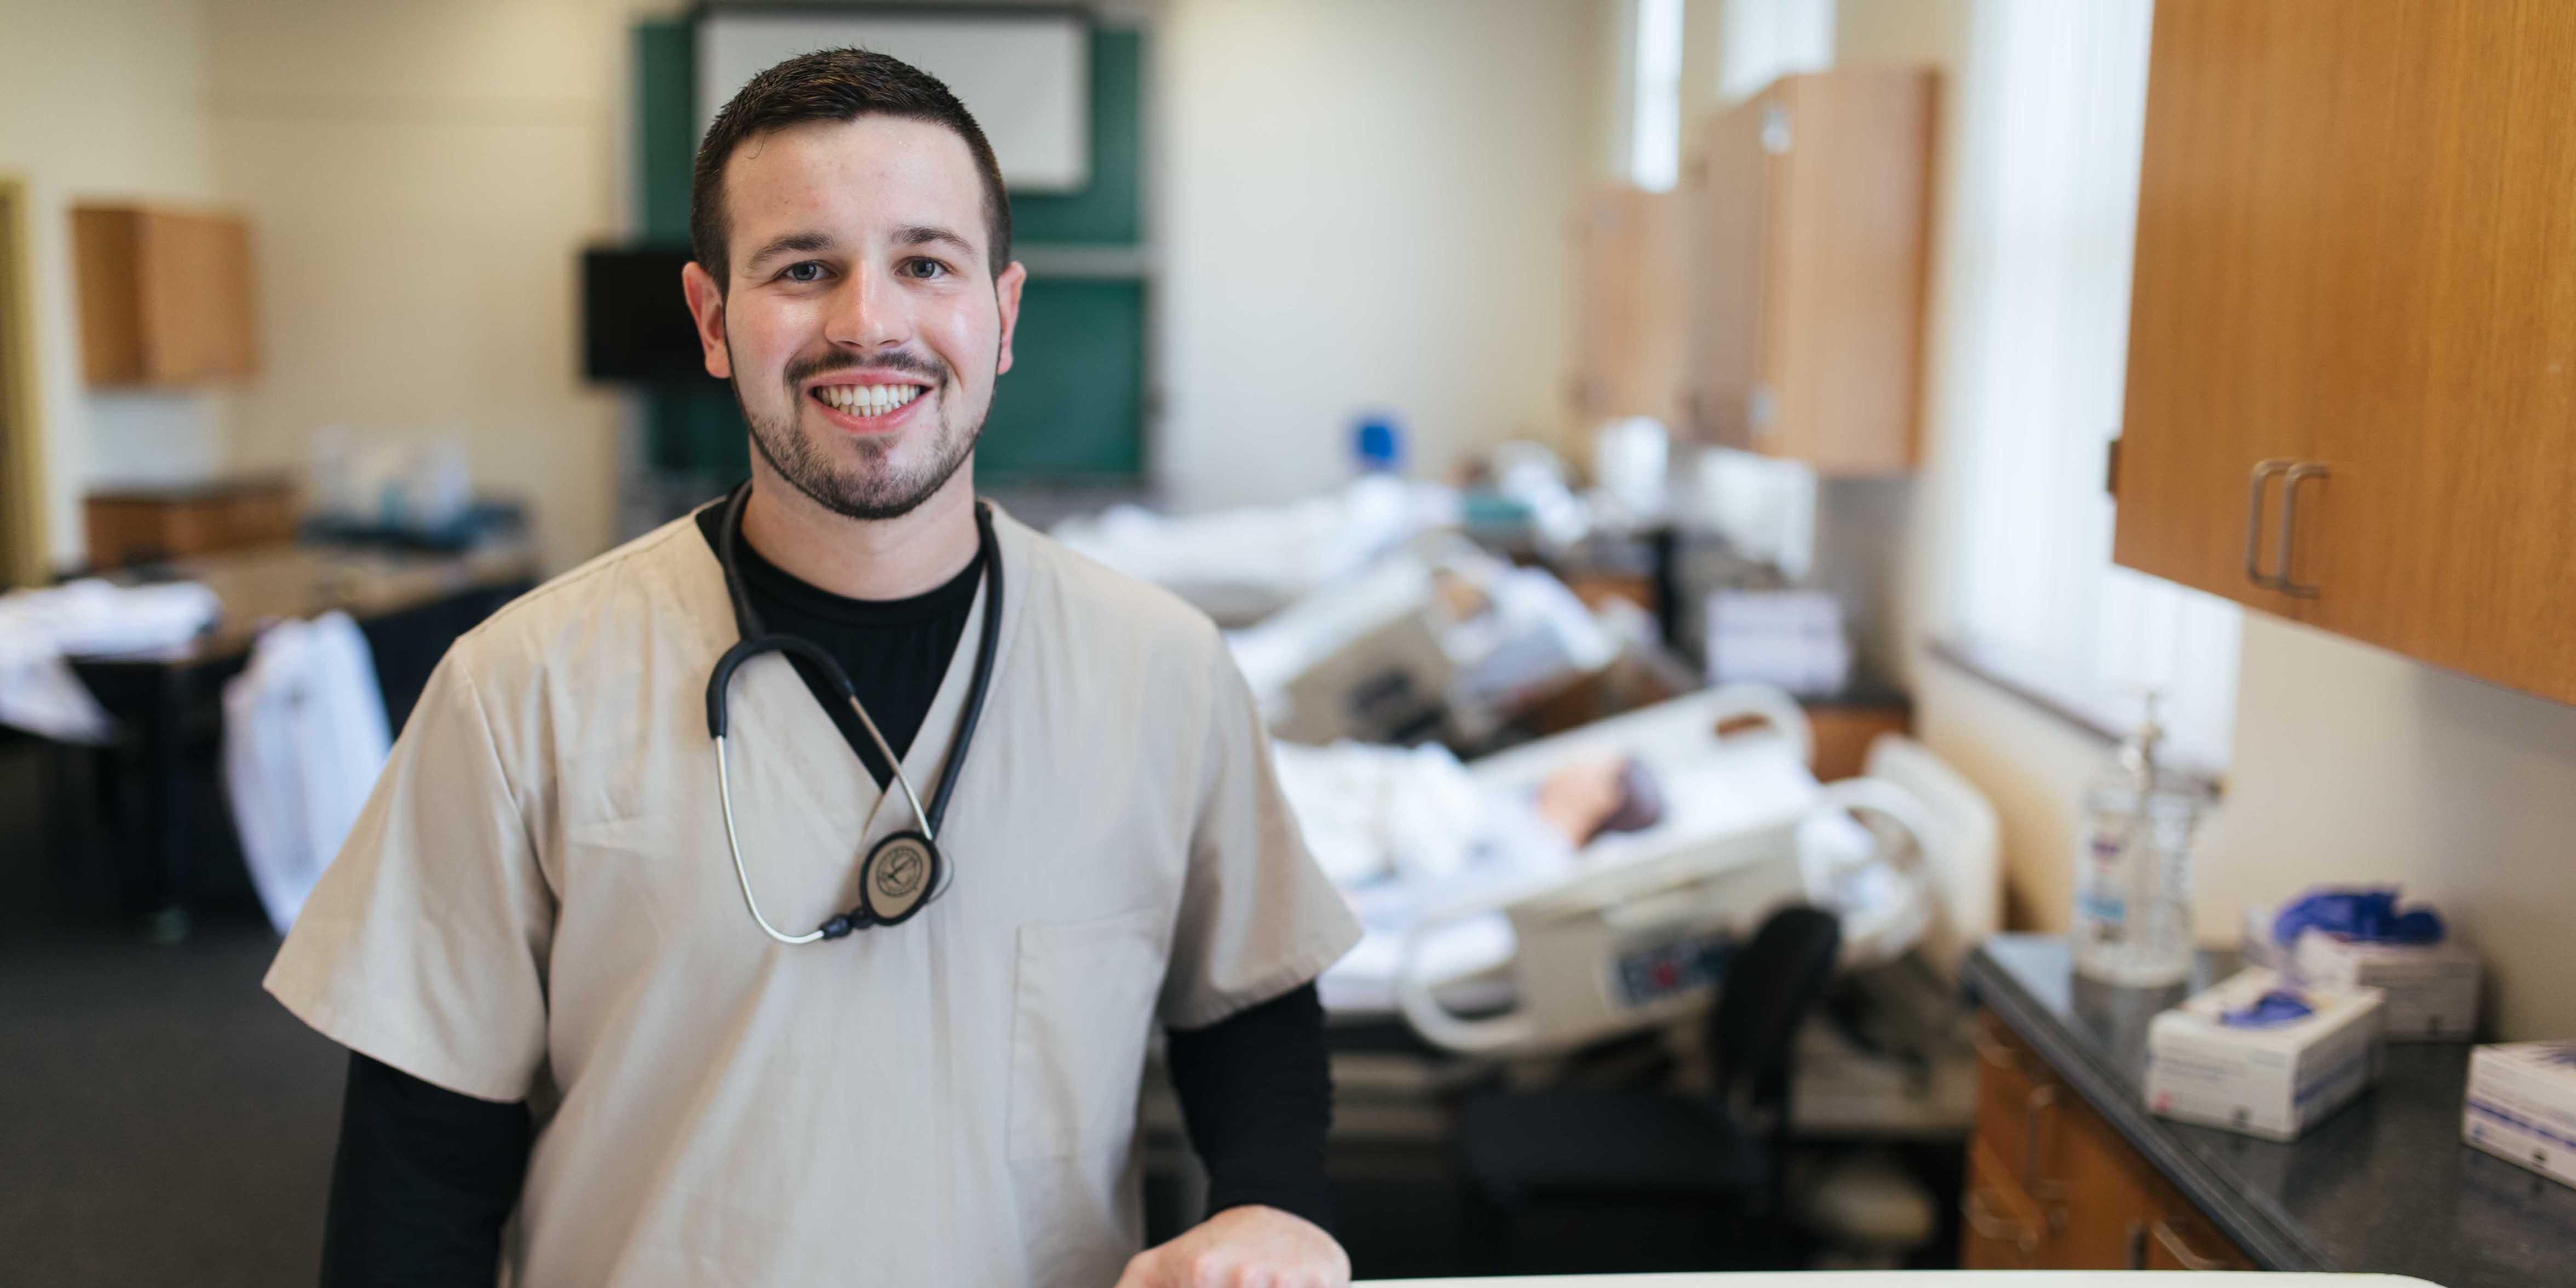 Nursing student in scrubs in simulation lab